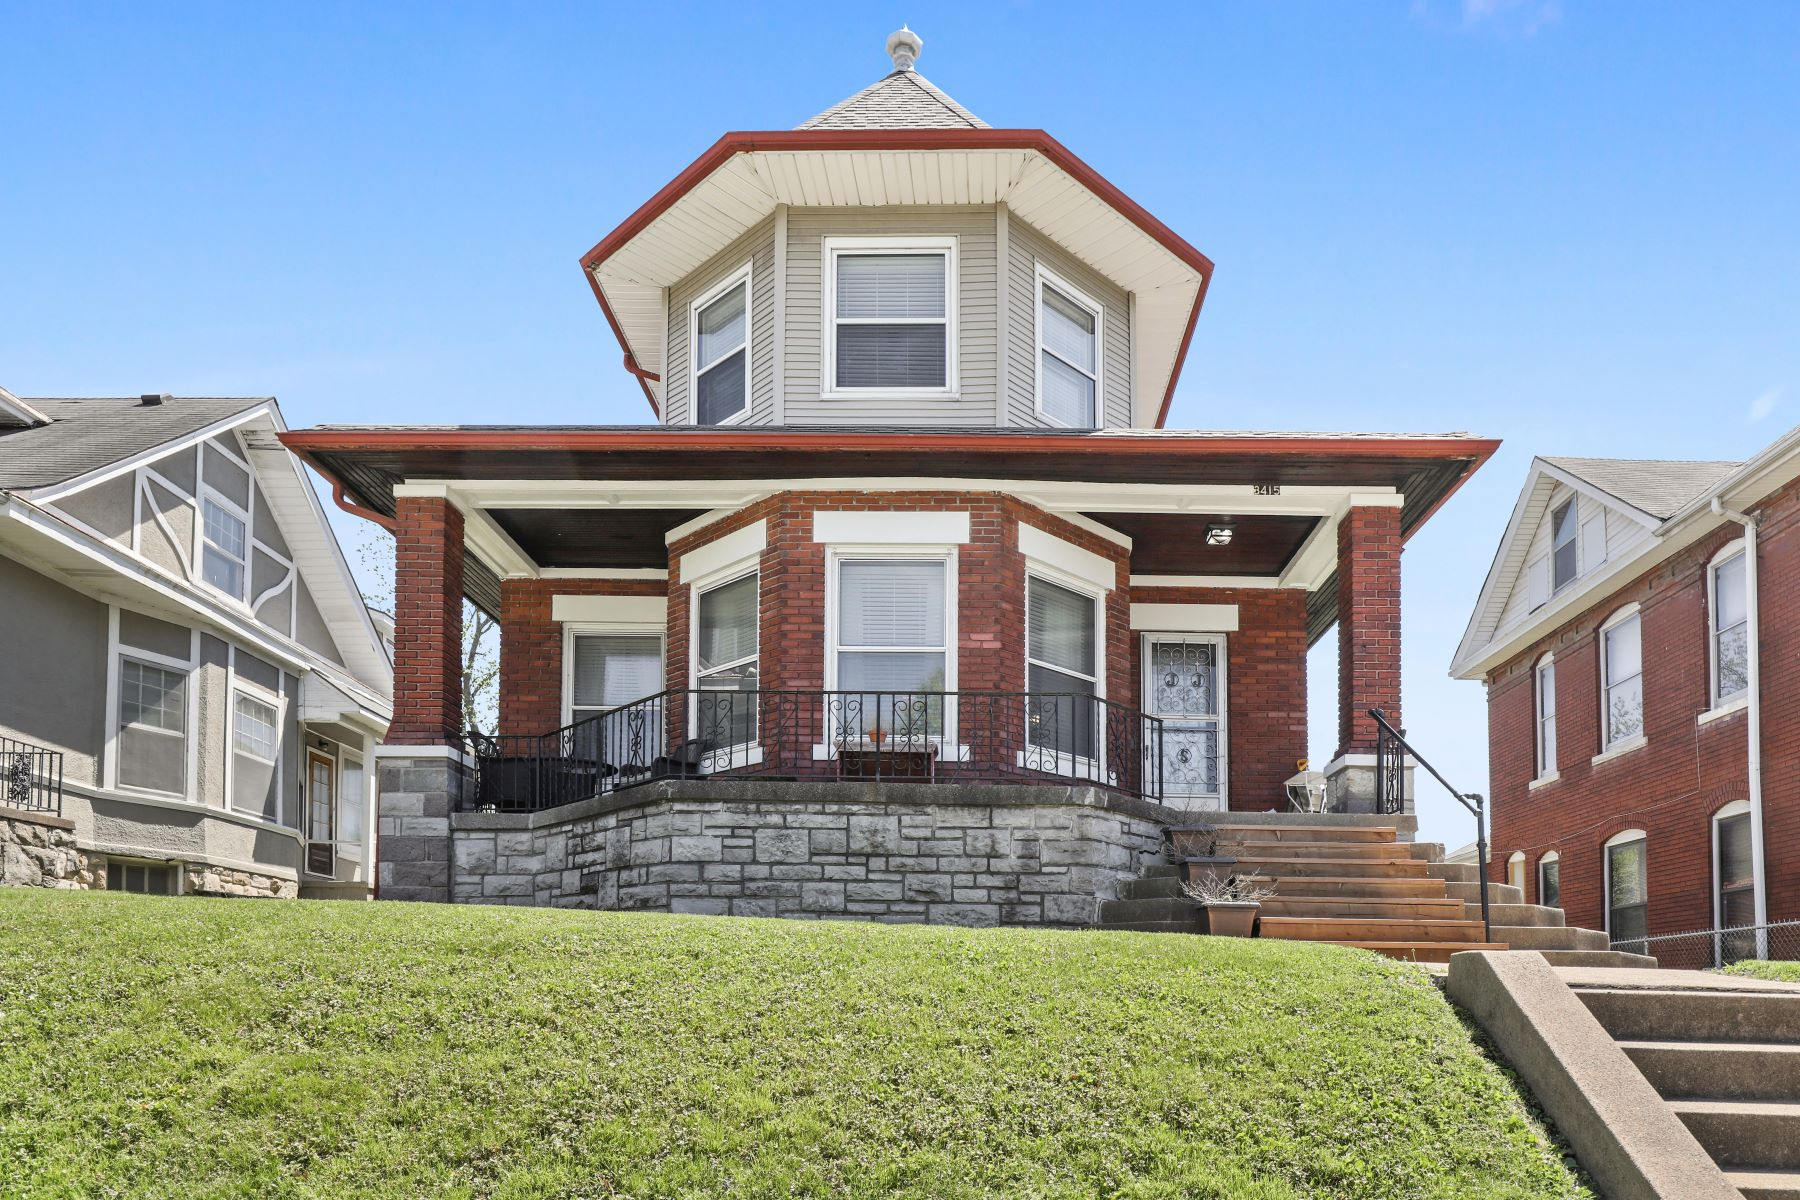 Single Family Homes for Active at Historic Northeast Kansas City 3415 Saint John Avenue Kansas City, Missouri 64123 United States